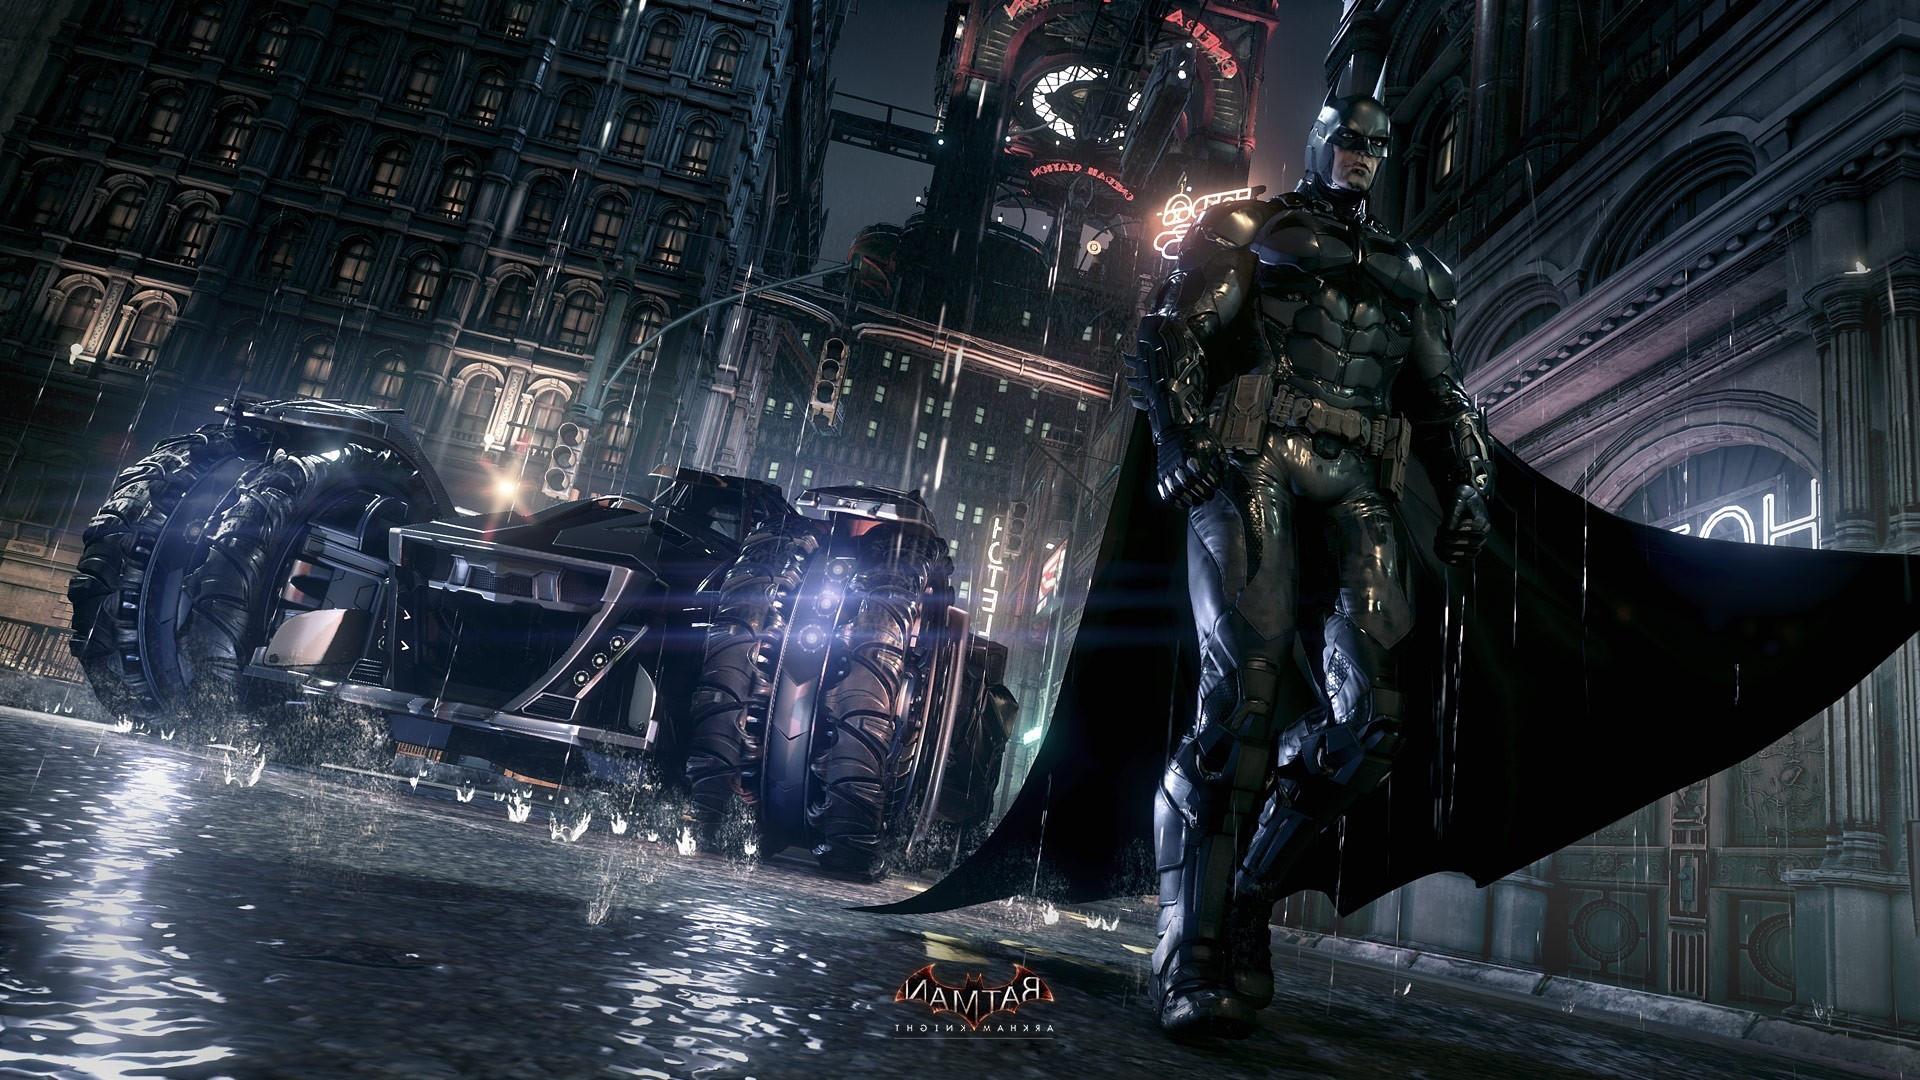 138 Batman Arkham Knight Hd Wallpapers Backgrounds Wallpaper Bat